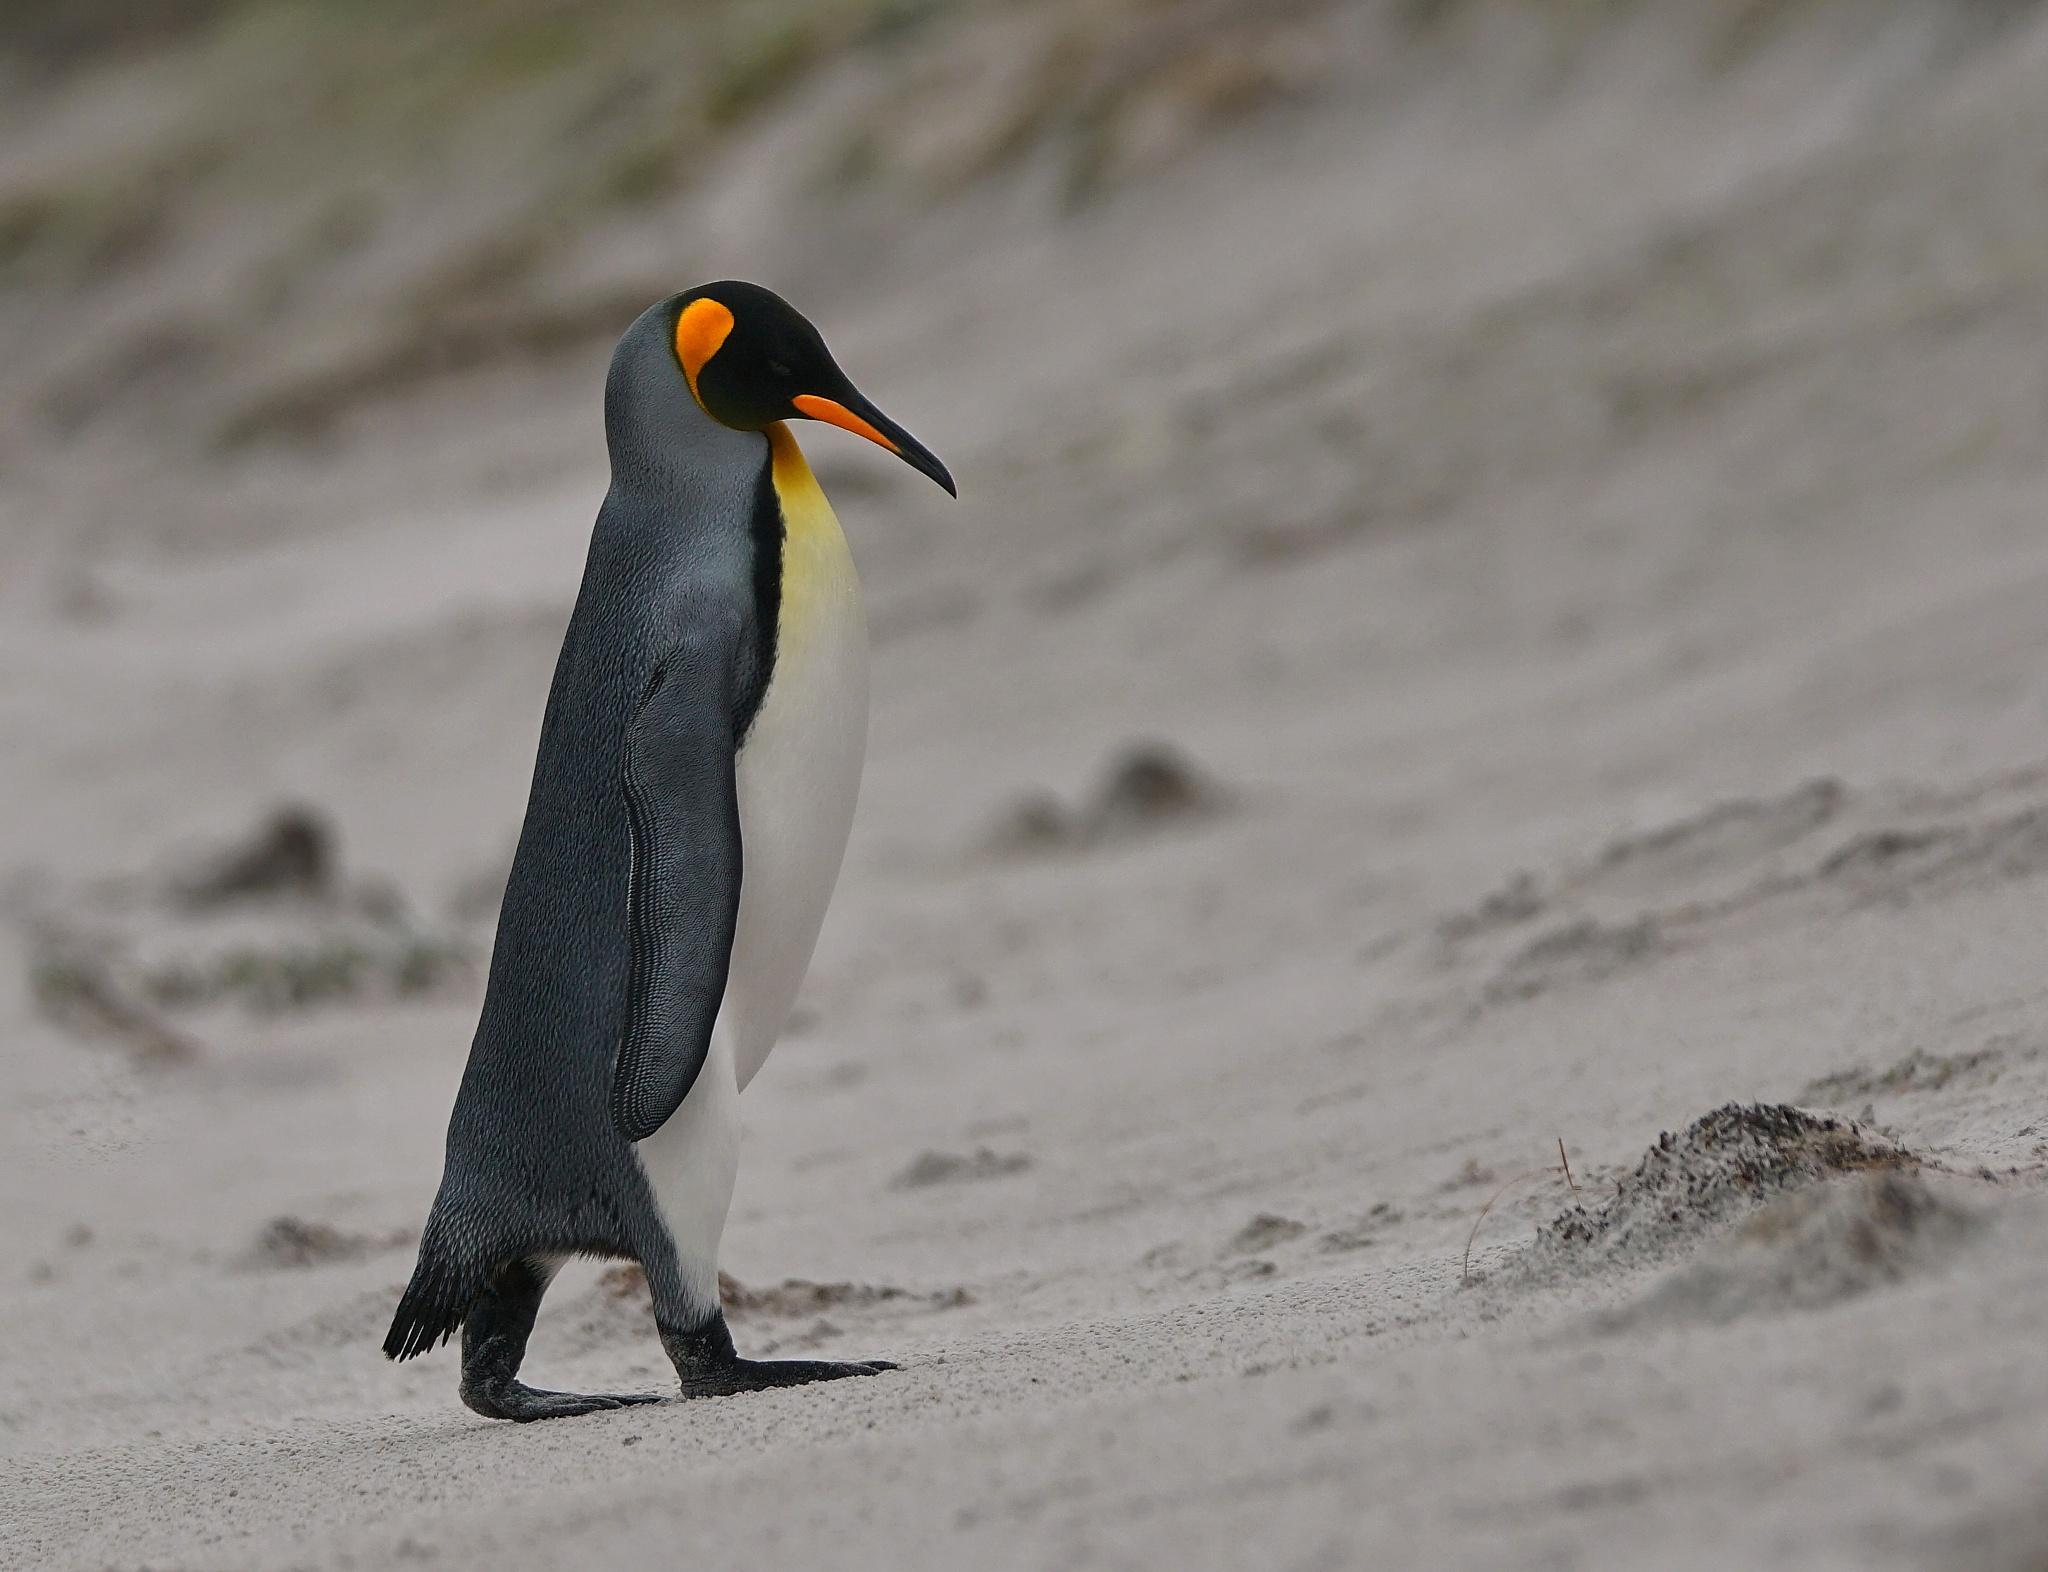 Falkland Islands by RenéBaldinger